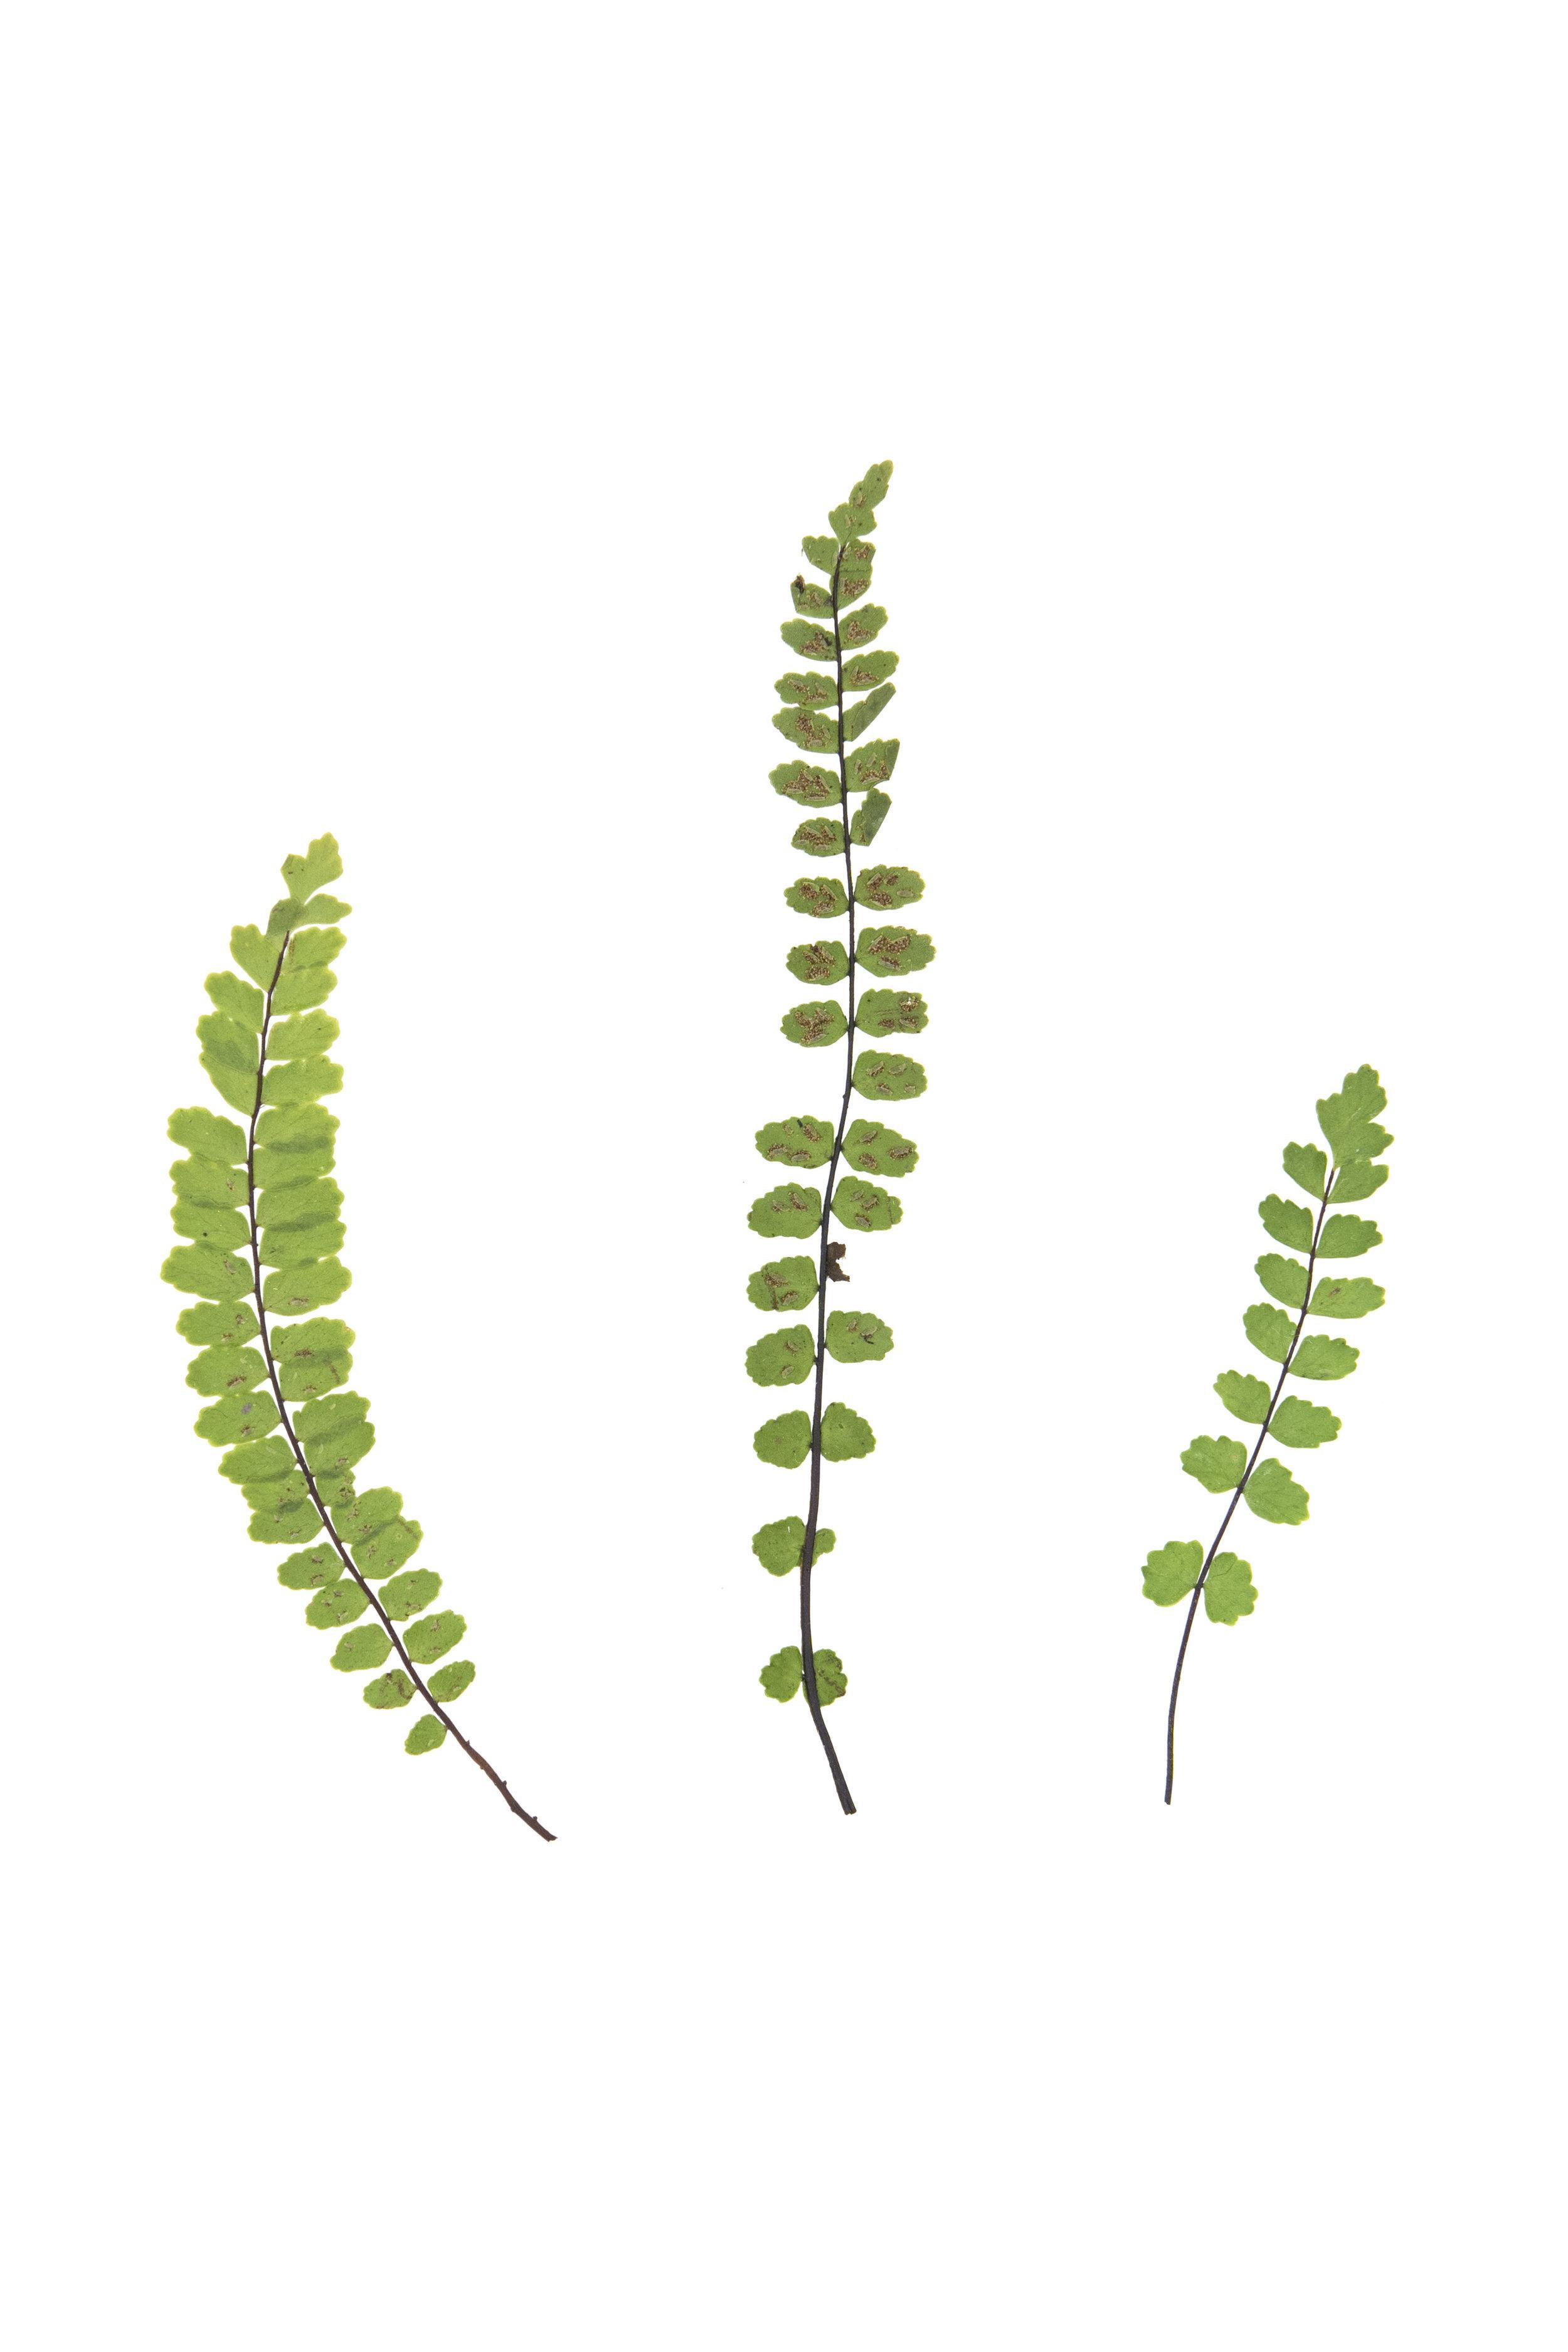 New! Maidenhair Spleenwort / Asplenium trichomanes